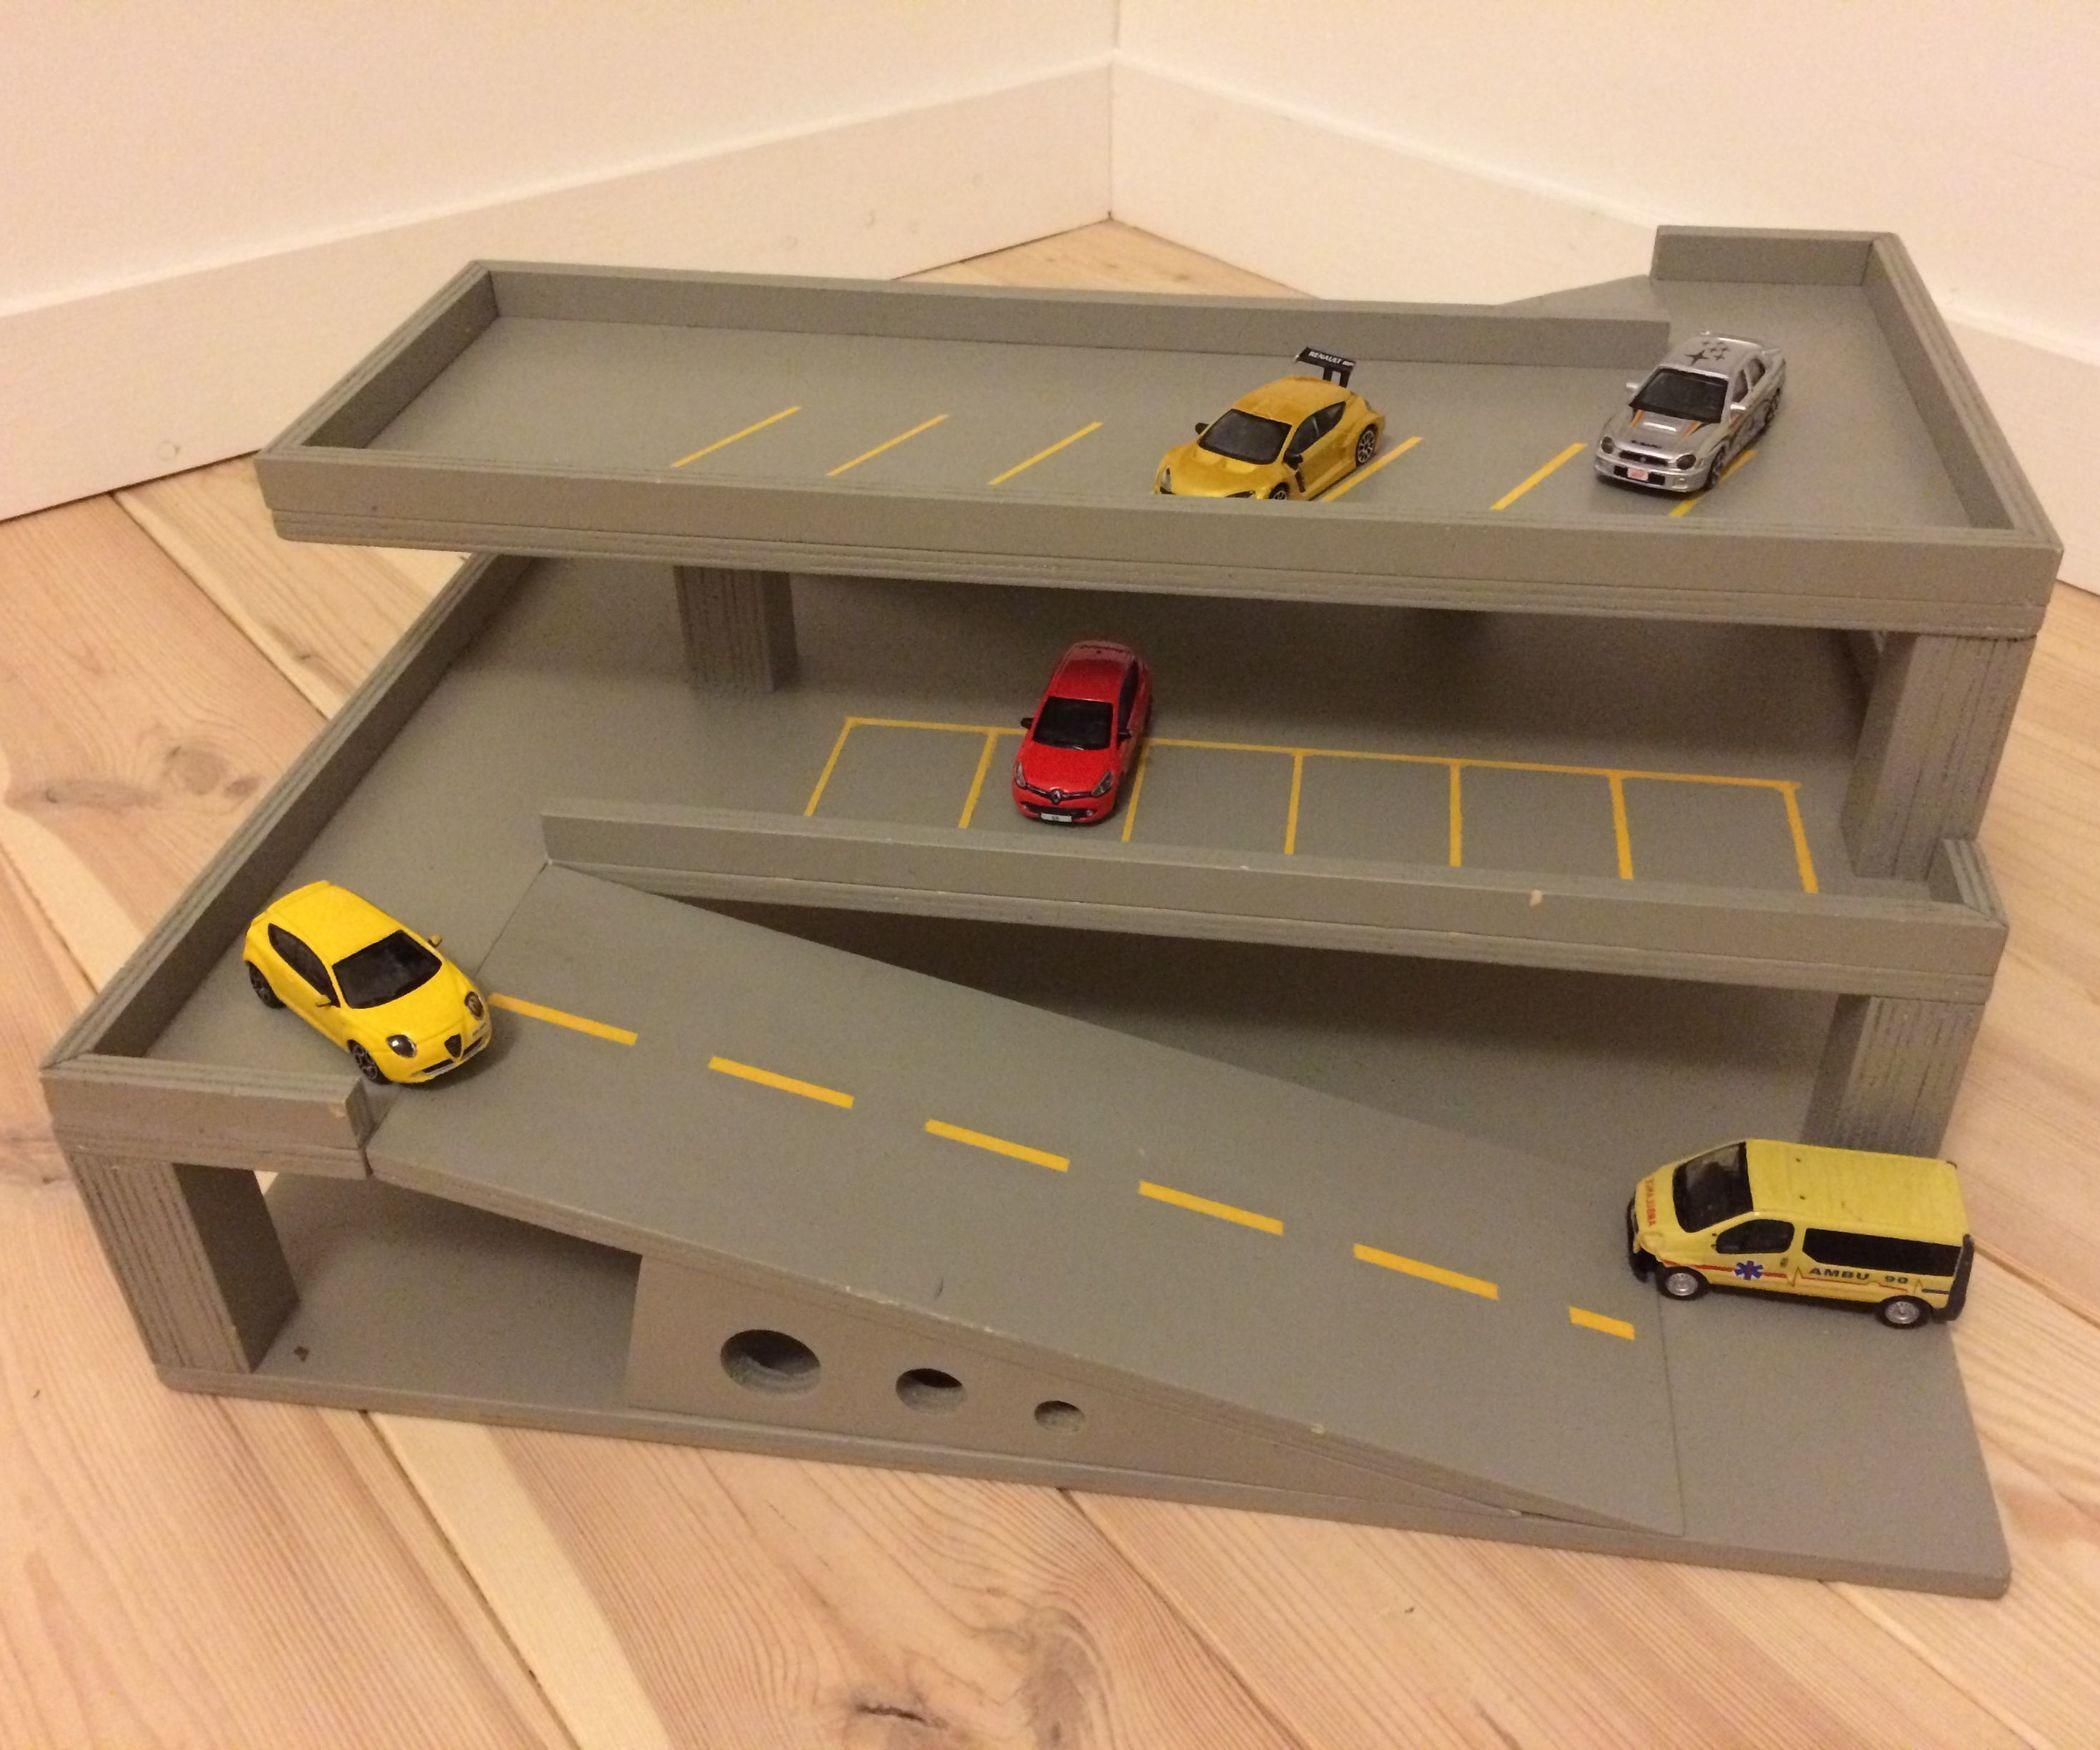 toy parking woodworking plans diy pinterest juguetes juguetes de madera y cart n. Black Bedroom Furniture Sets. Home Design Ideas